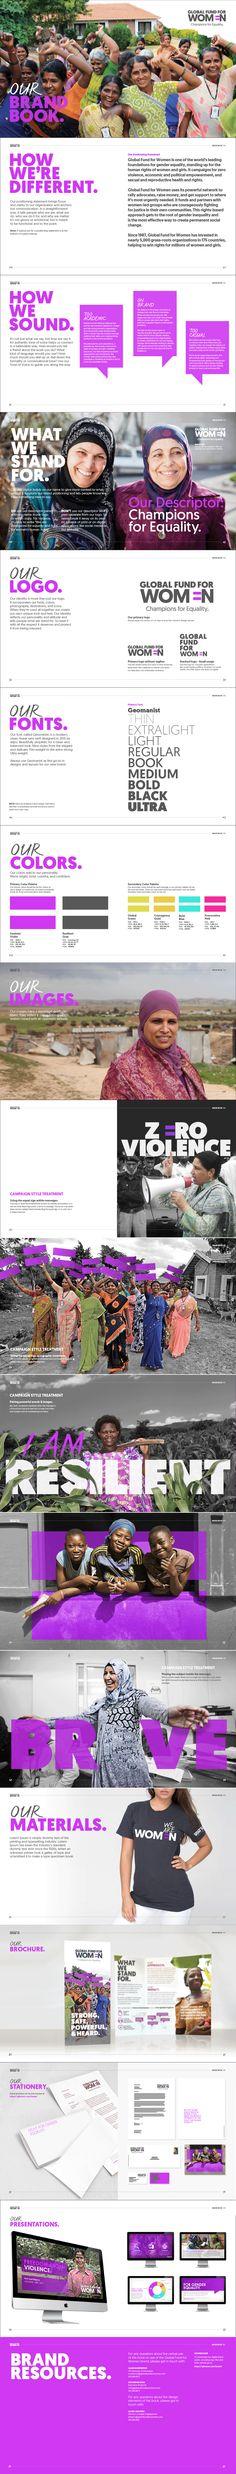 Global Fund for Women - Brand Book Global Fund, Brand Book, Women Brands, Web Design, Design Web, Website Designs, Site Design